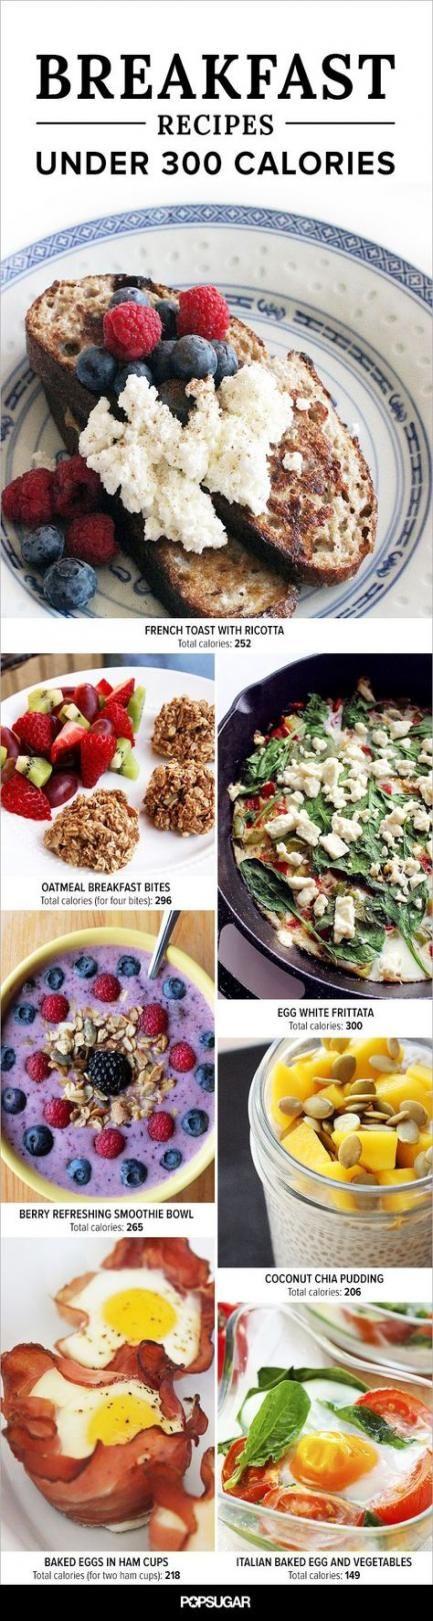 Fitness Food Healthy Brunch Recipes 38+ Ideas #food #fitness #recipes